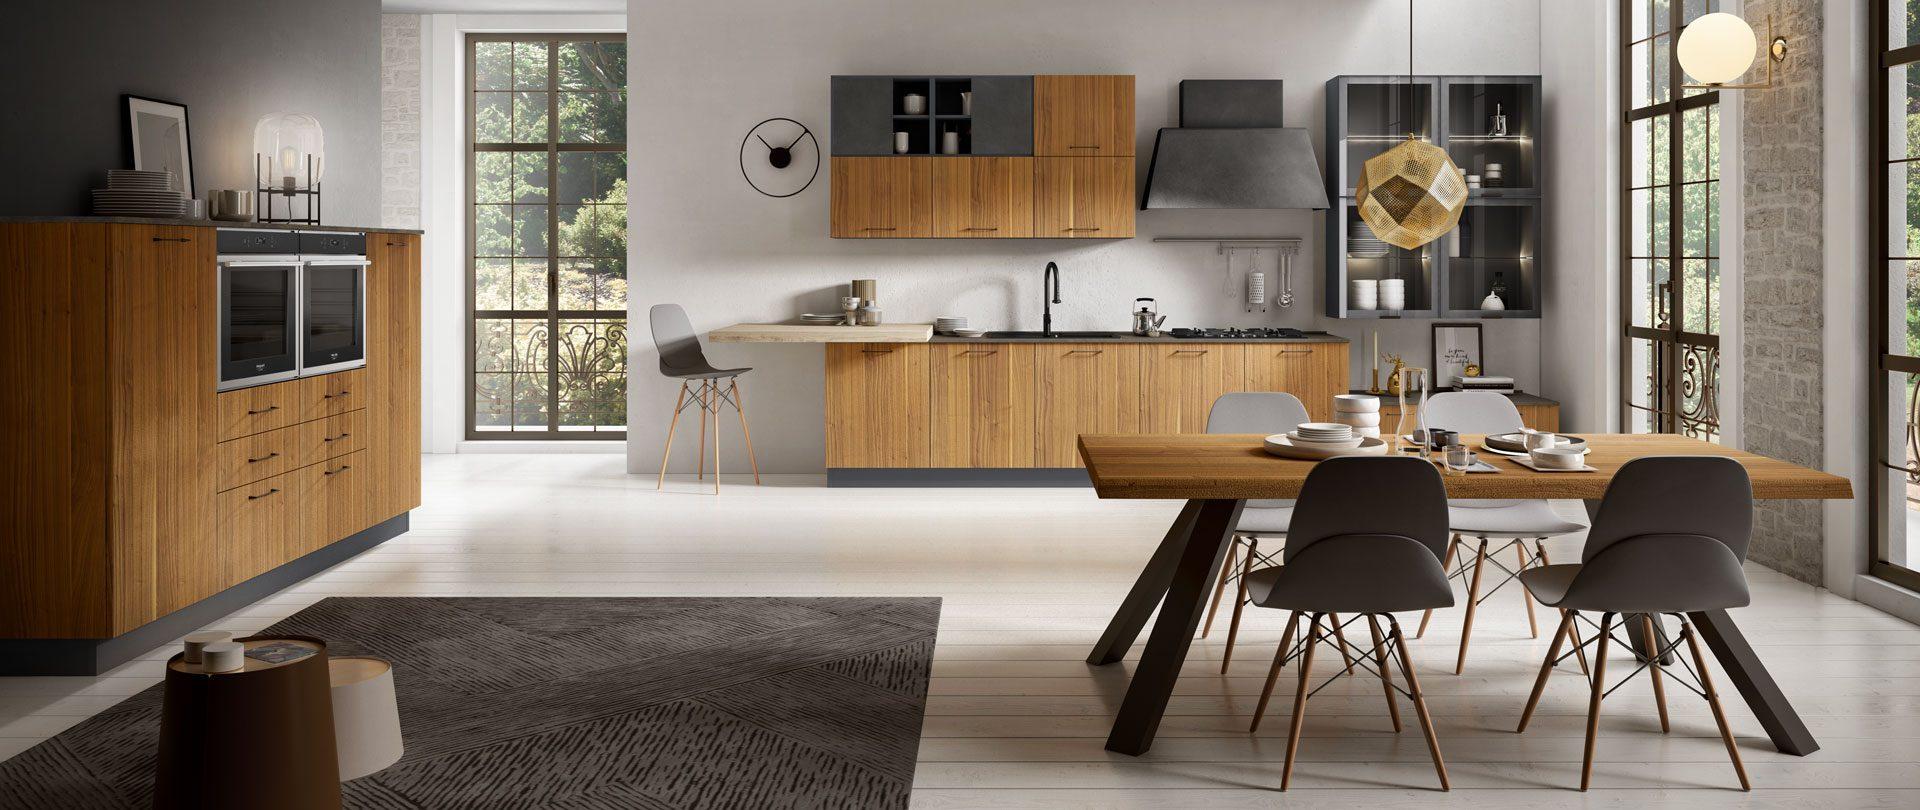 Cucina funzionale è la nuova nata in casa Mobilturi: Matrix